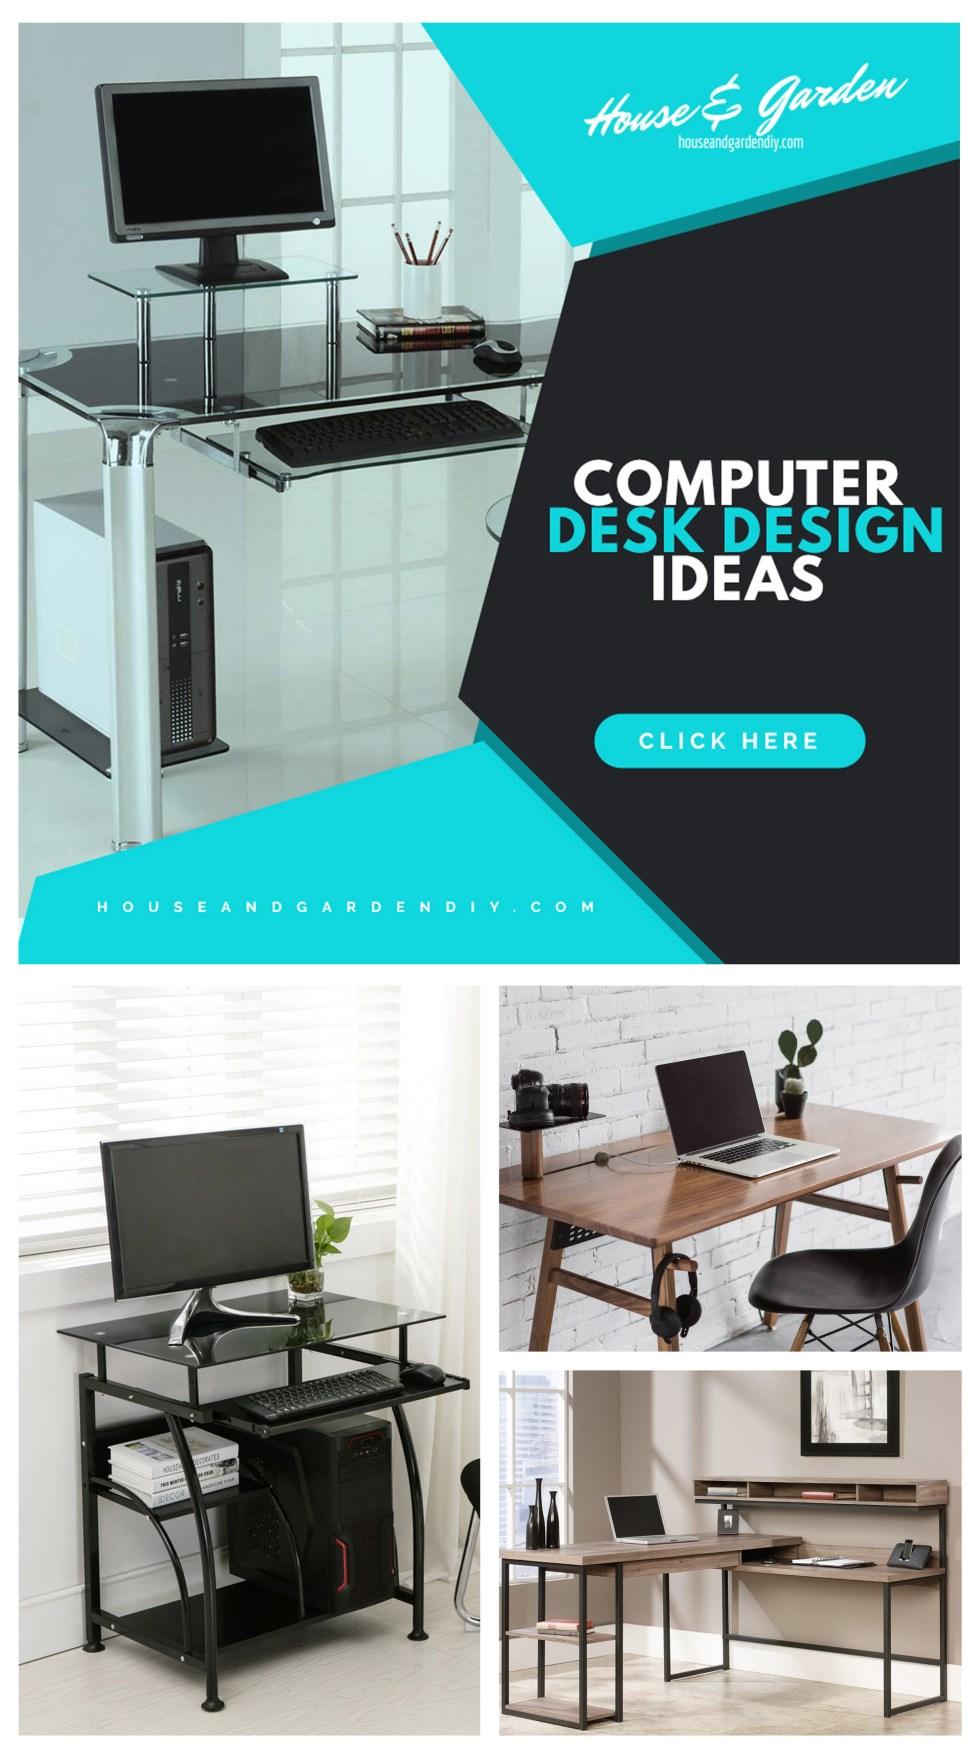 Computer Desk Design Ideas